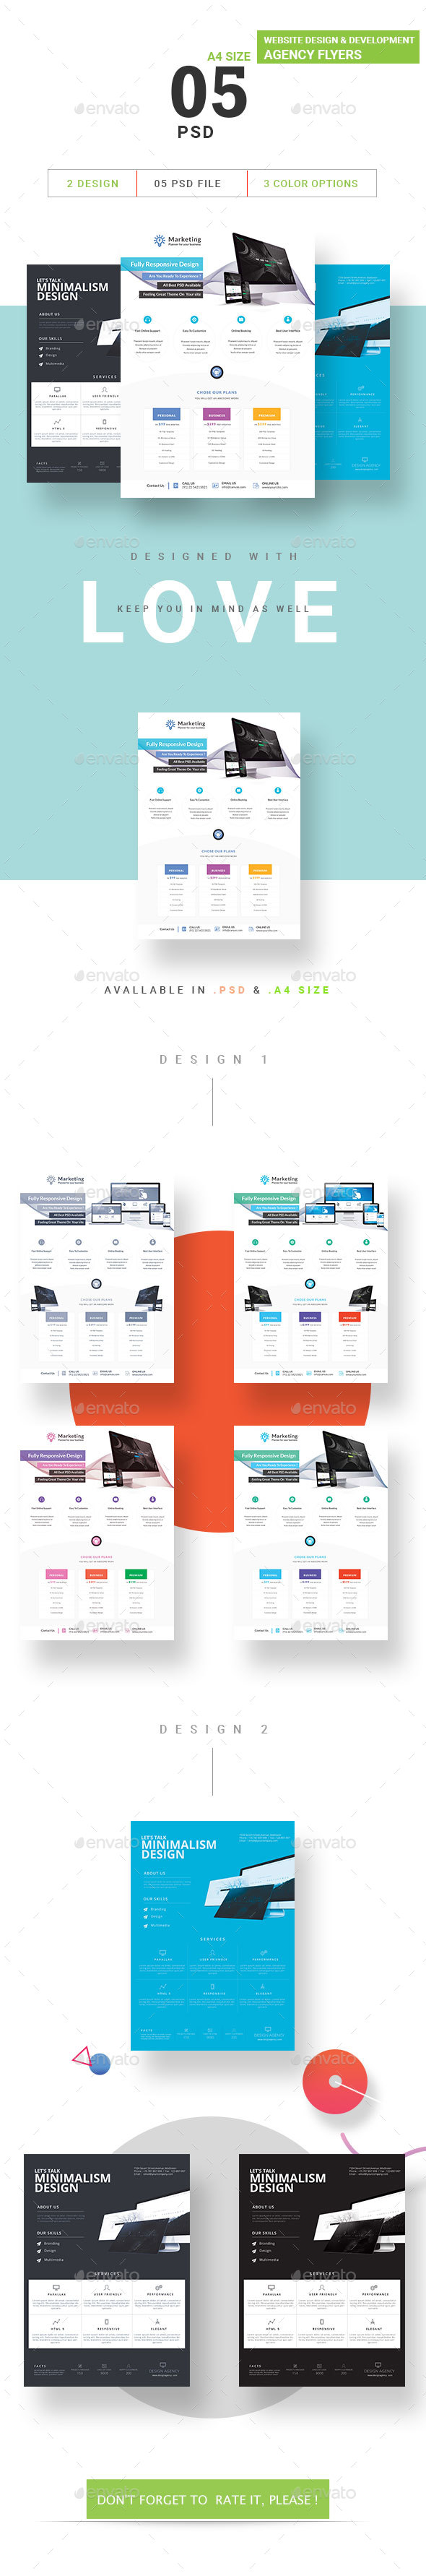 Website Design & Development Agency Flyers Bundle - Flyers Print Templates